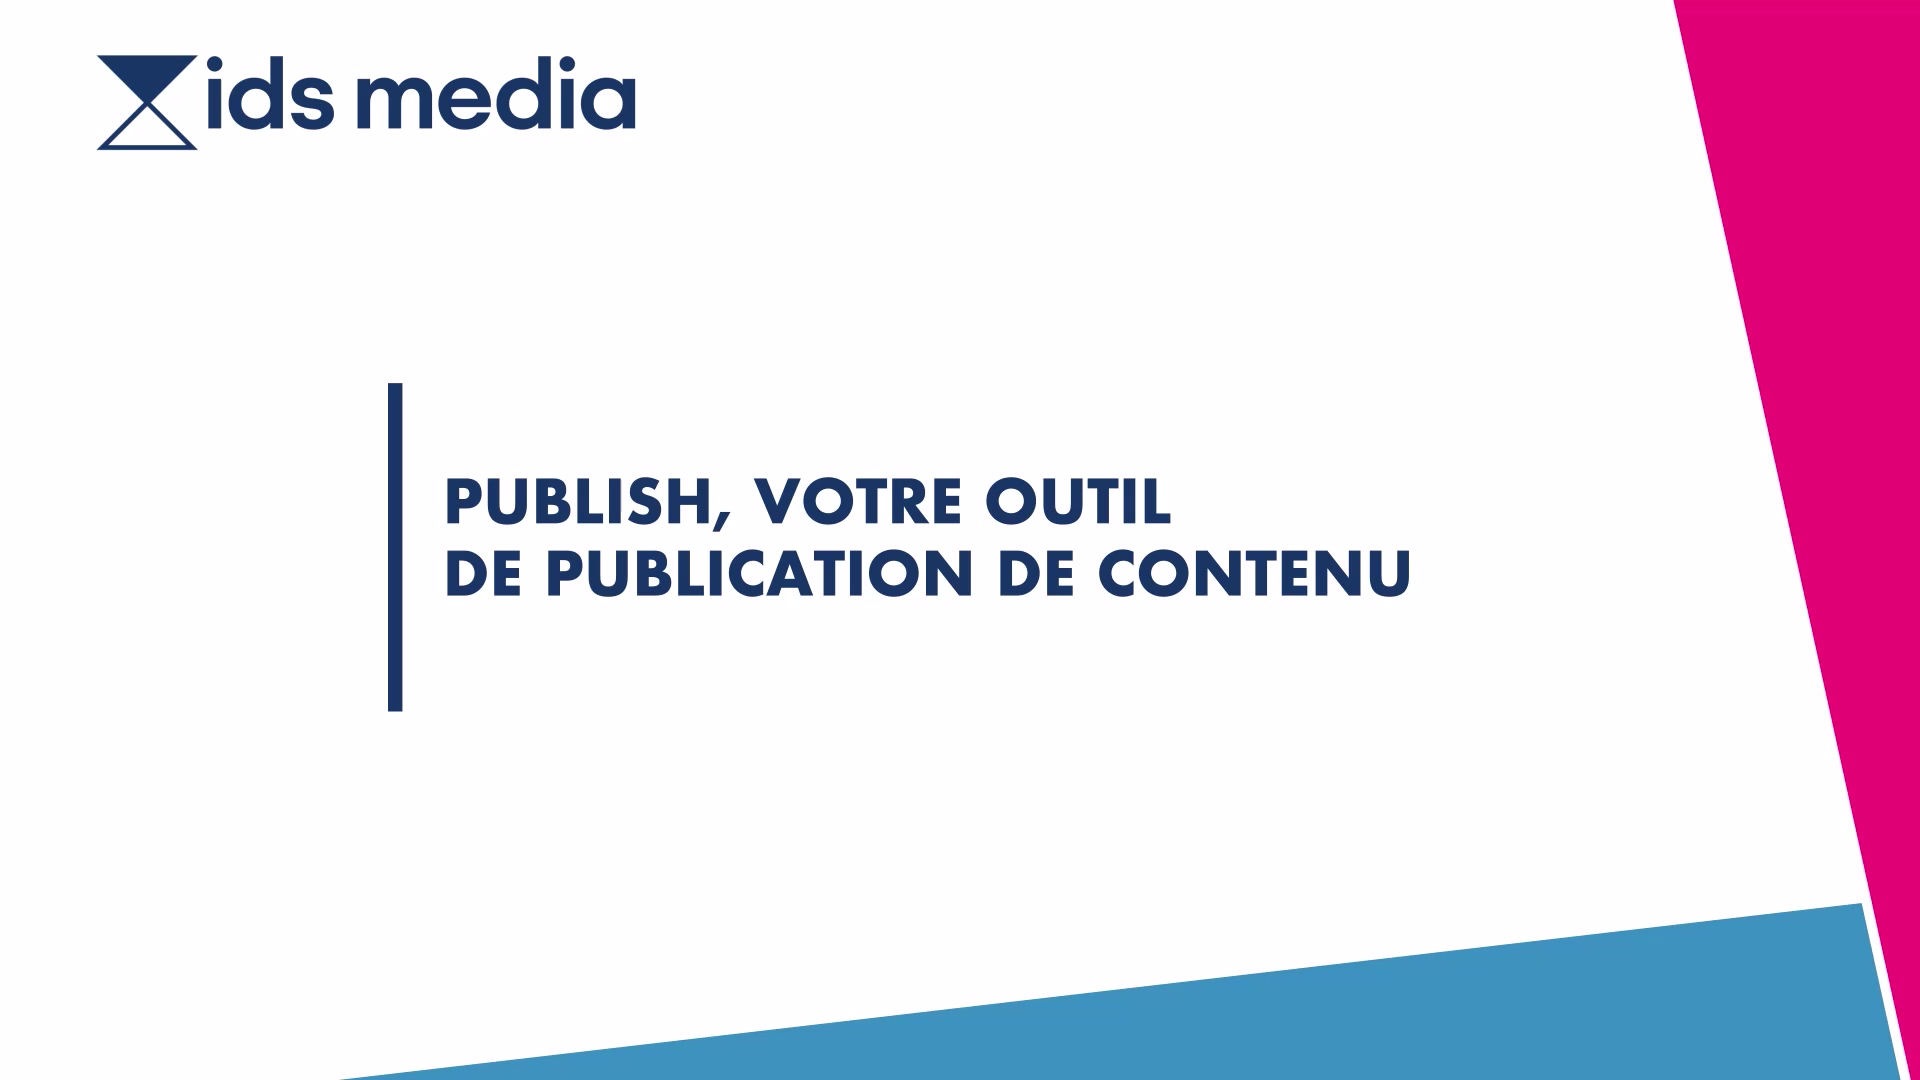 PRESENTATION_PLATEFORME_PUBLISH_IDS_MEDIA - sans contact